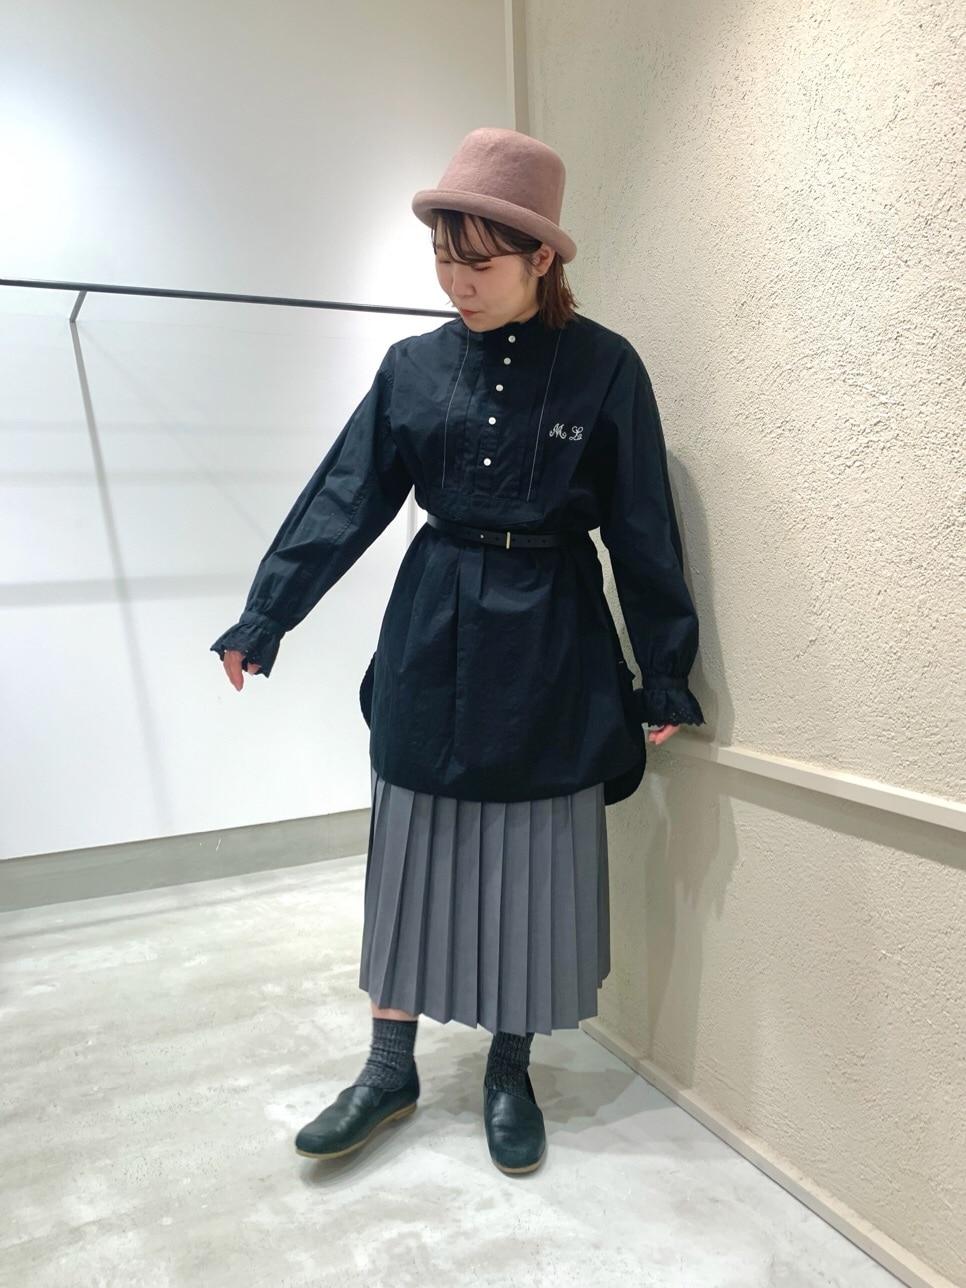 chambre de charme 横浜ジョイナス 身長:155cm 2020.12.10